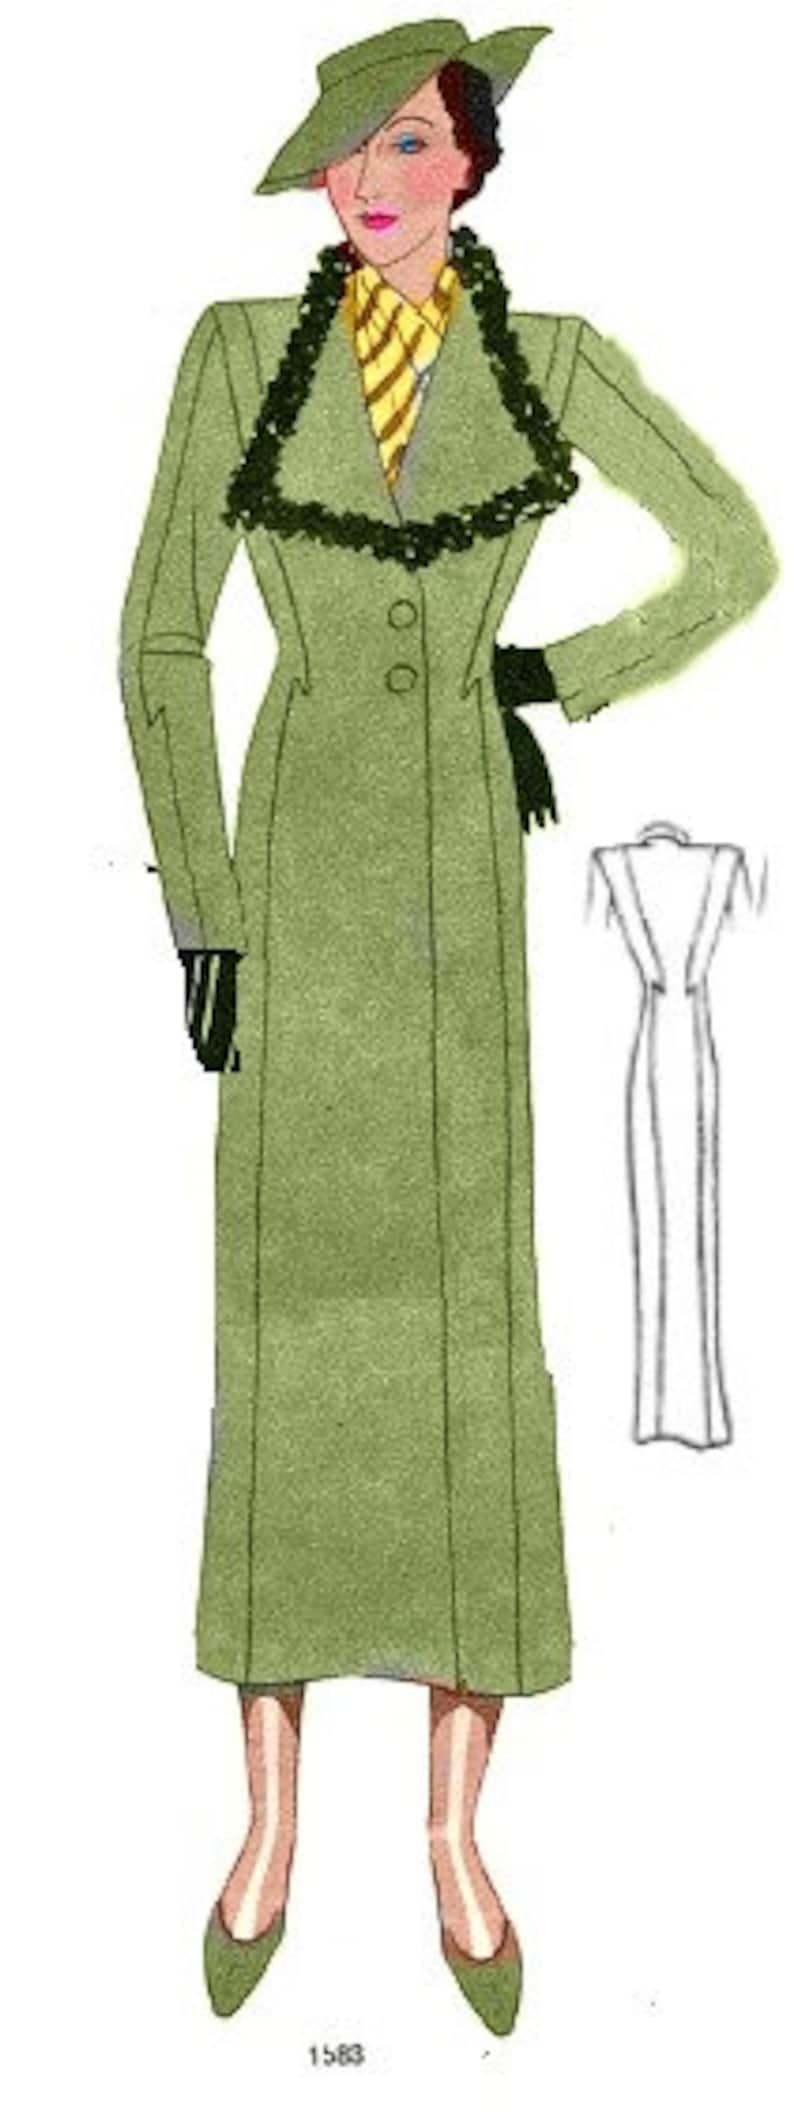 1930s Vintage Dresses, Clothing & Patterns Links Plus Size (or any size) Vintage 1934 Coat Jacket Sewing Pattern - PDF - Pattern 1583 Concetta 1930s 30s Patterns Instant Download $8.35 AT vintagedancer.com